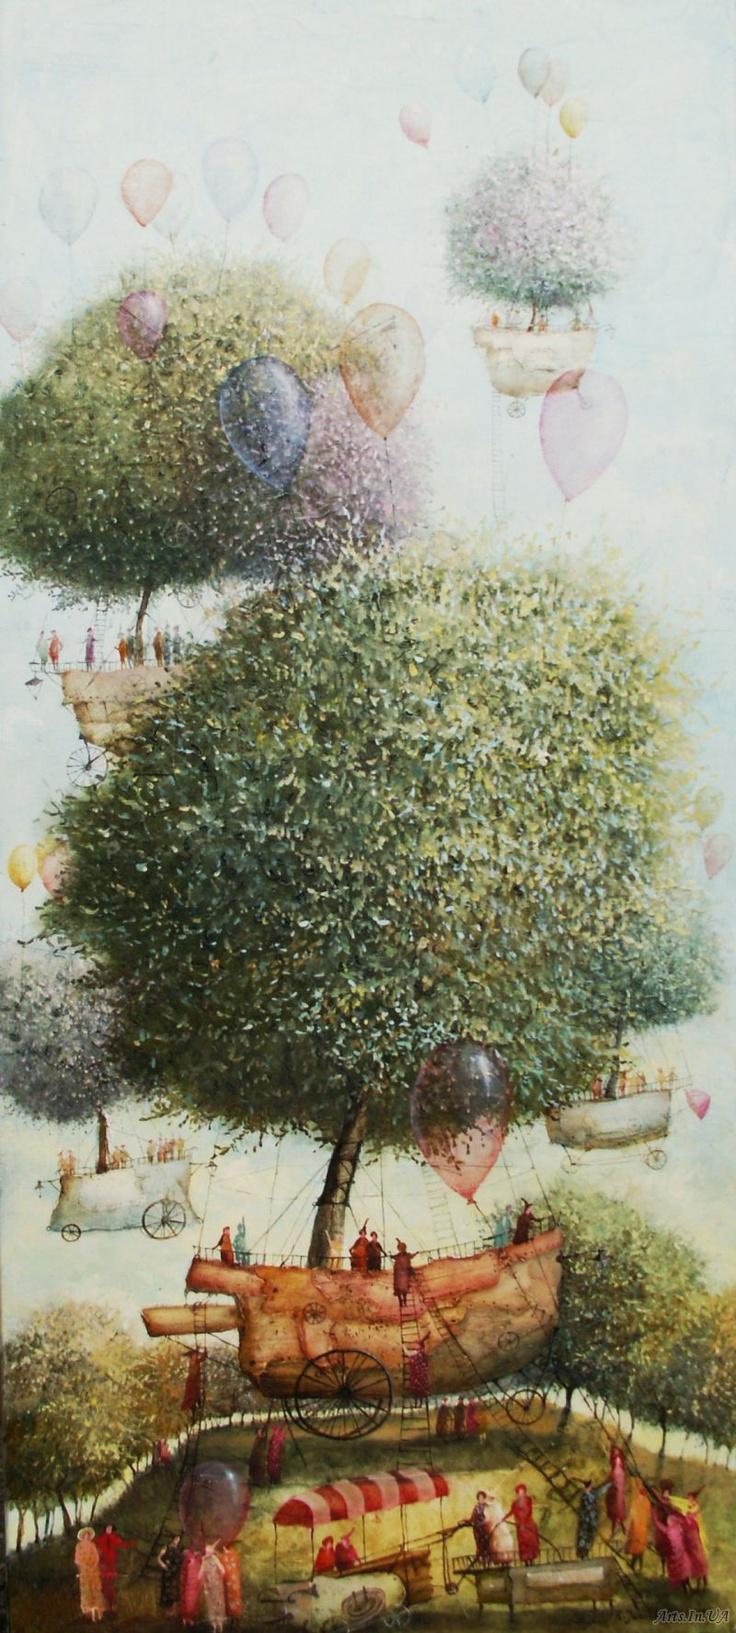 Artista: Januskevicius Remigijus - Flying Trees